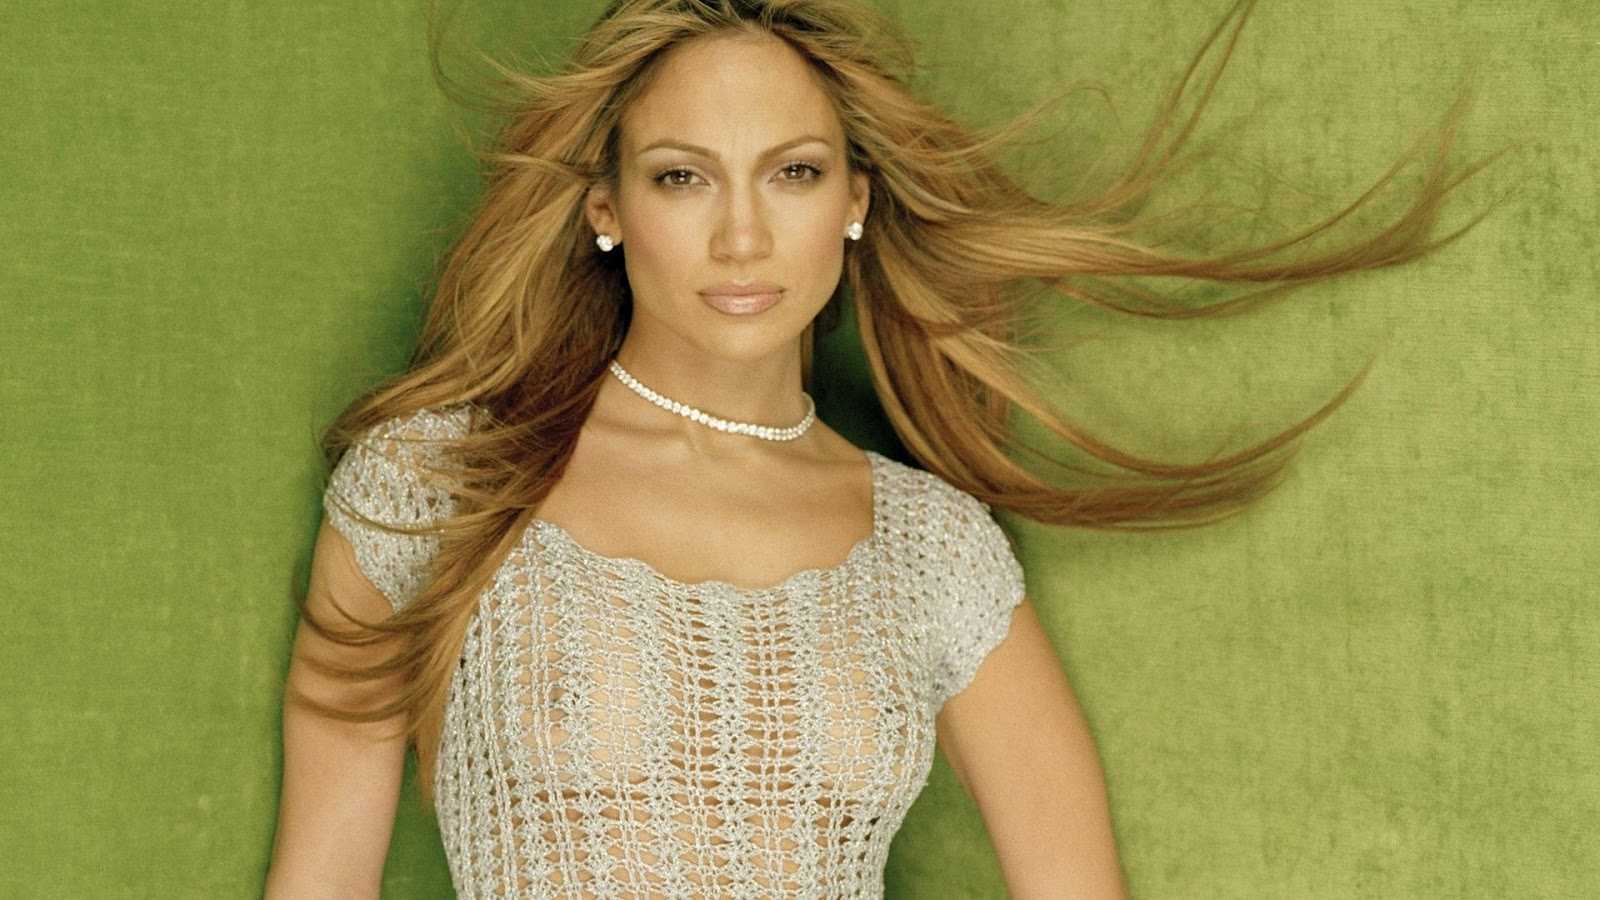 b4f43f53bb1 Jennifer Lopez Latest HD Wallpapers 2012 Wallpaper Backgrounds 1600x900